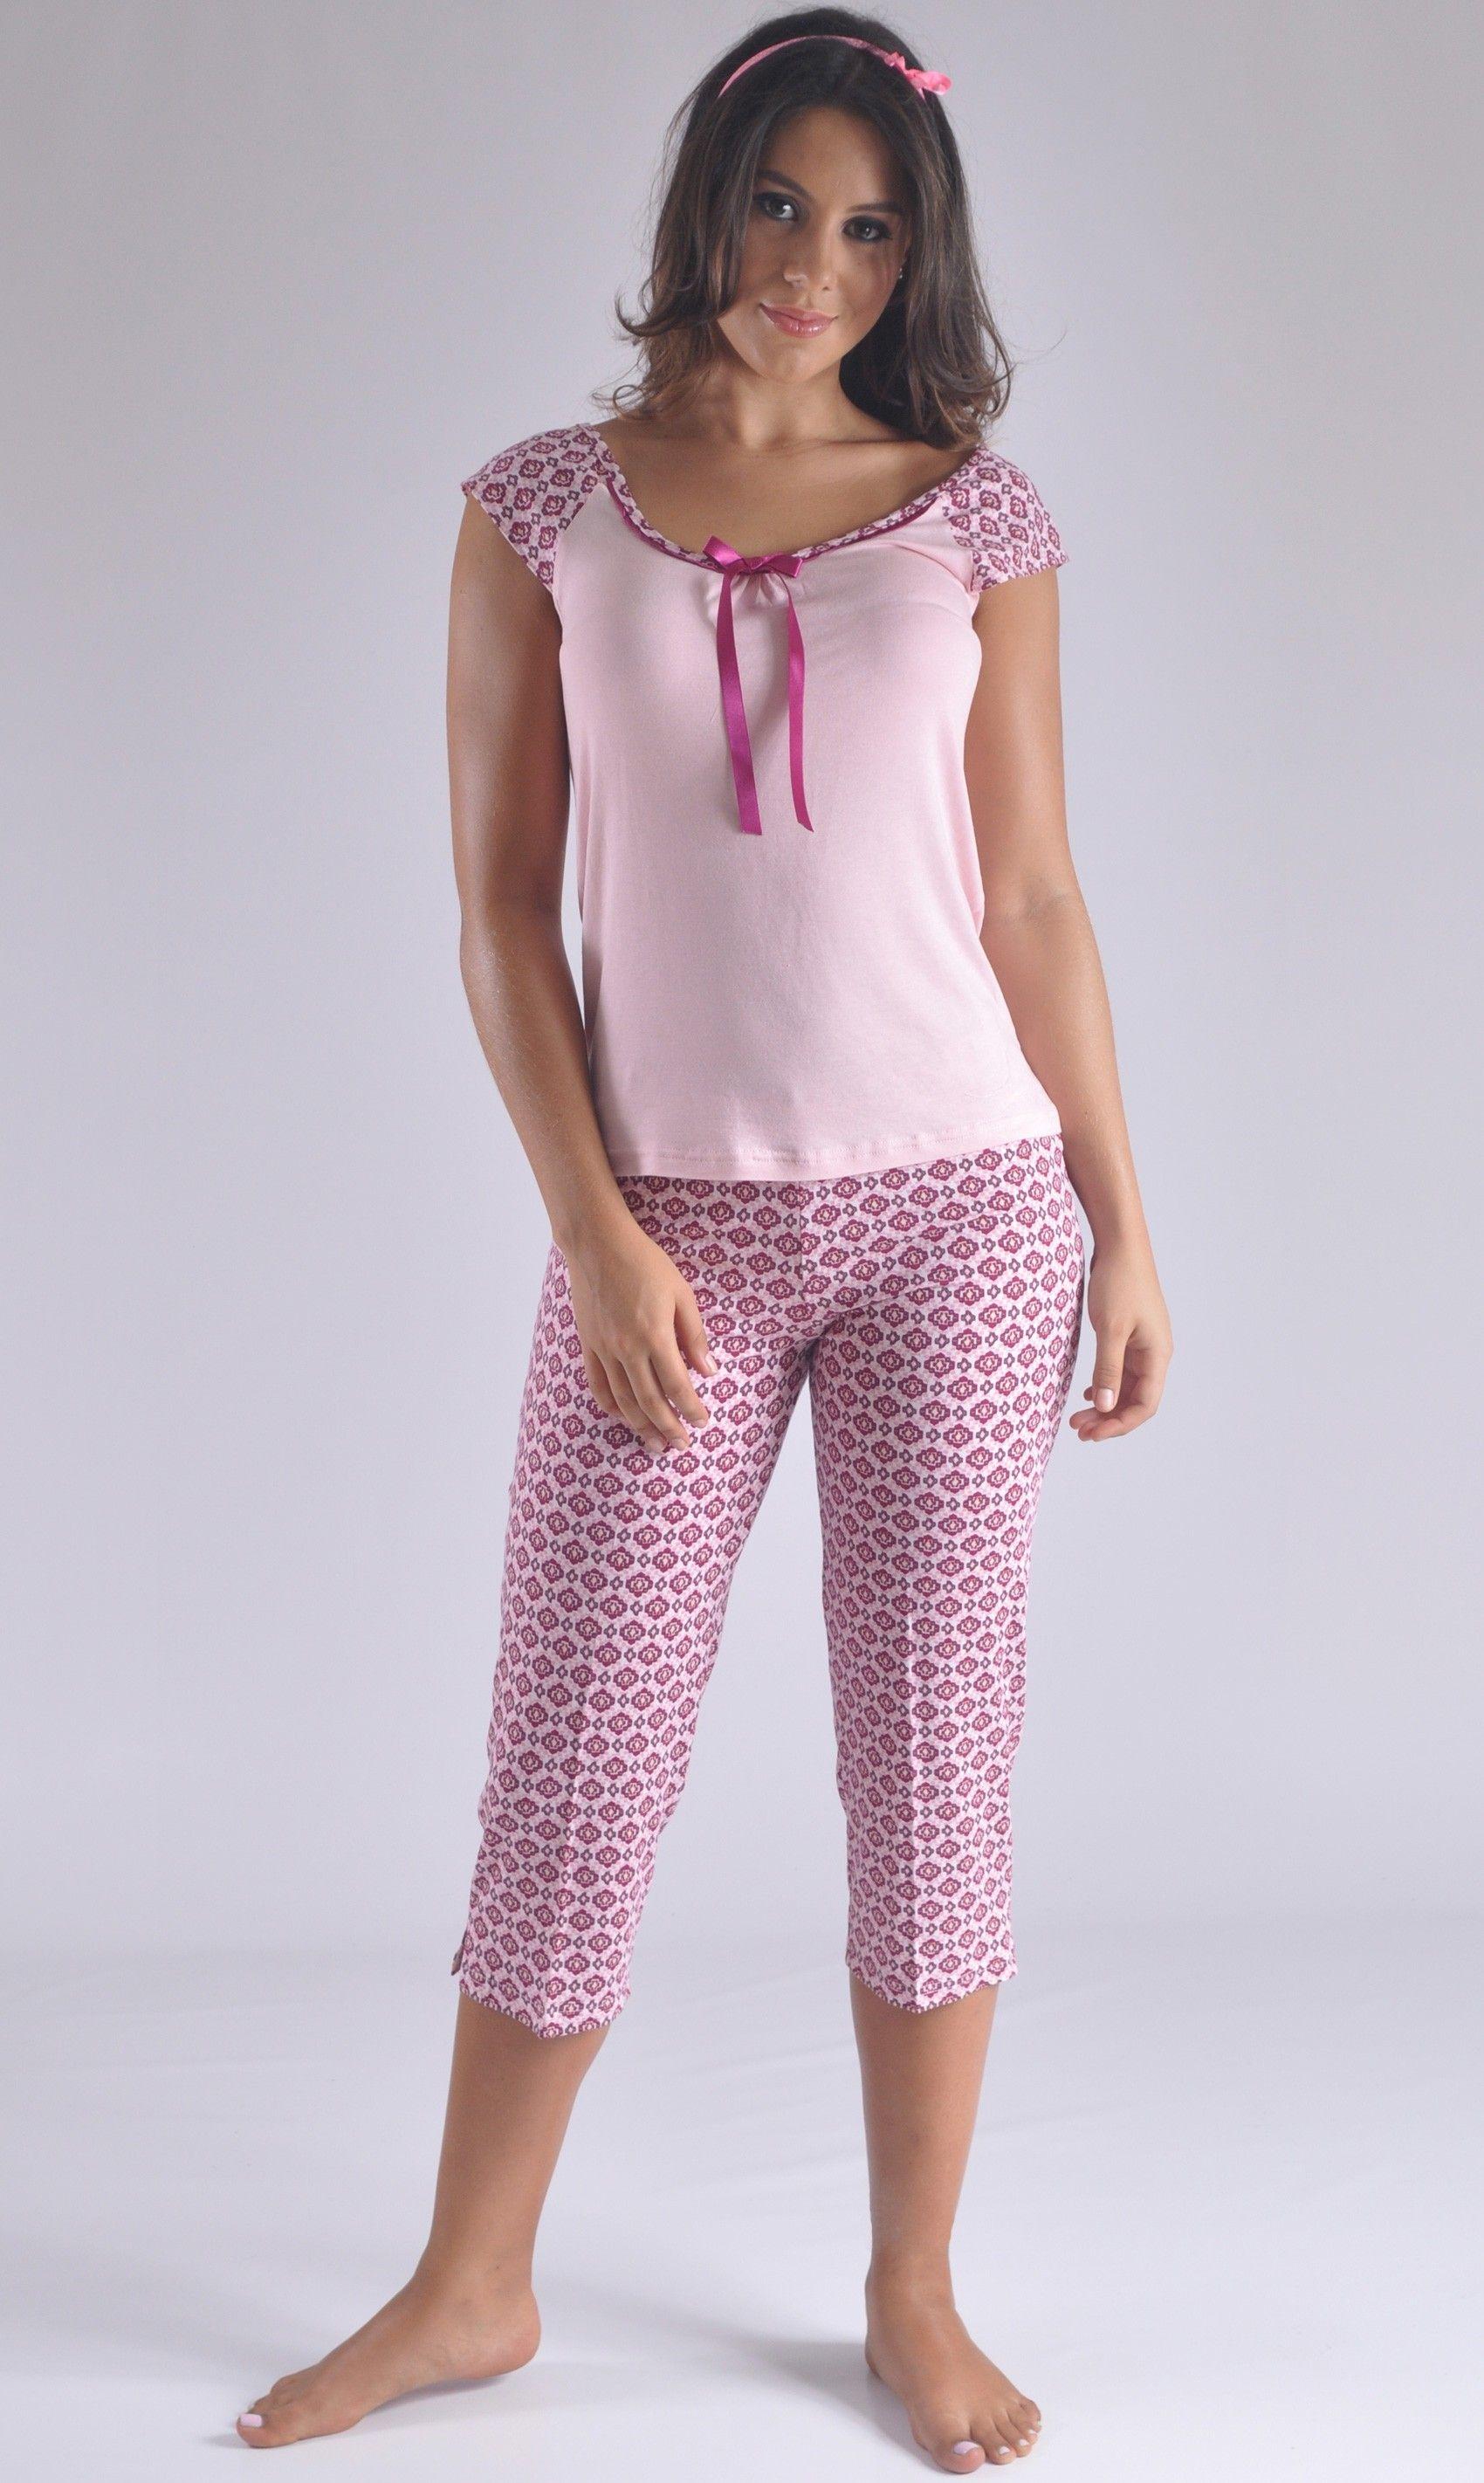 957974d49 Pijama Capry en viscosa fresca y moderna Camisones Mujer